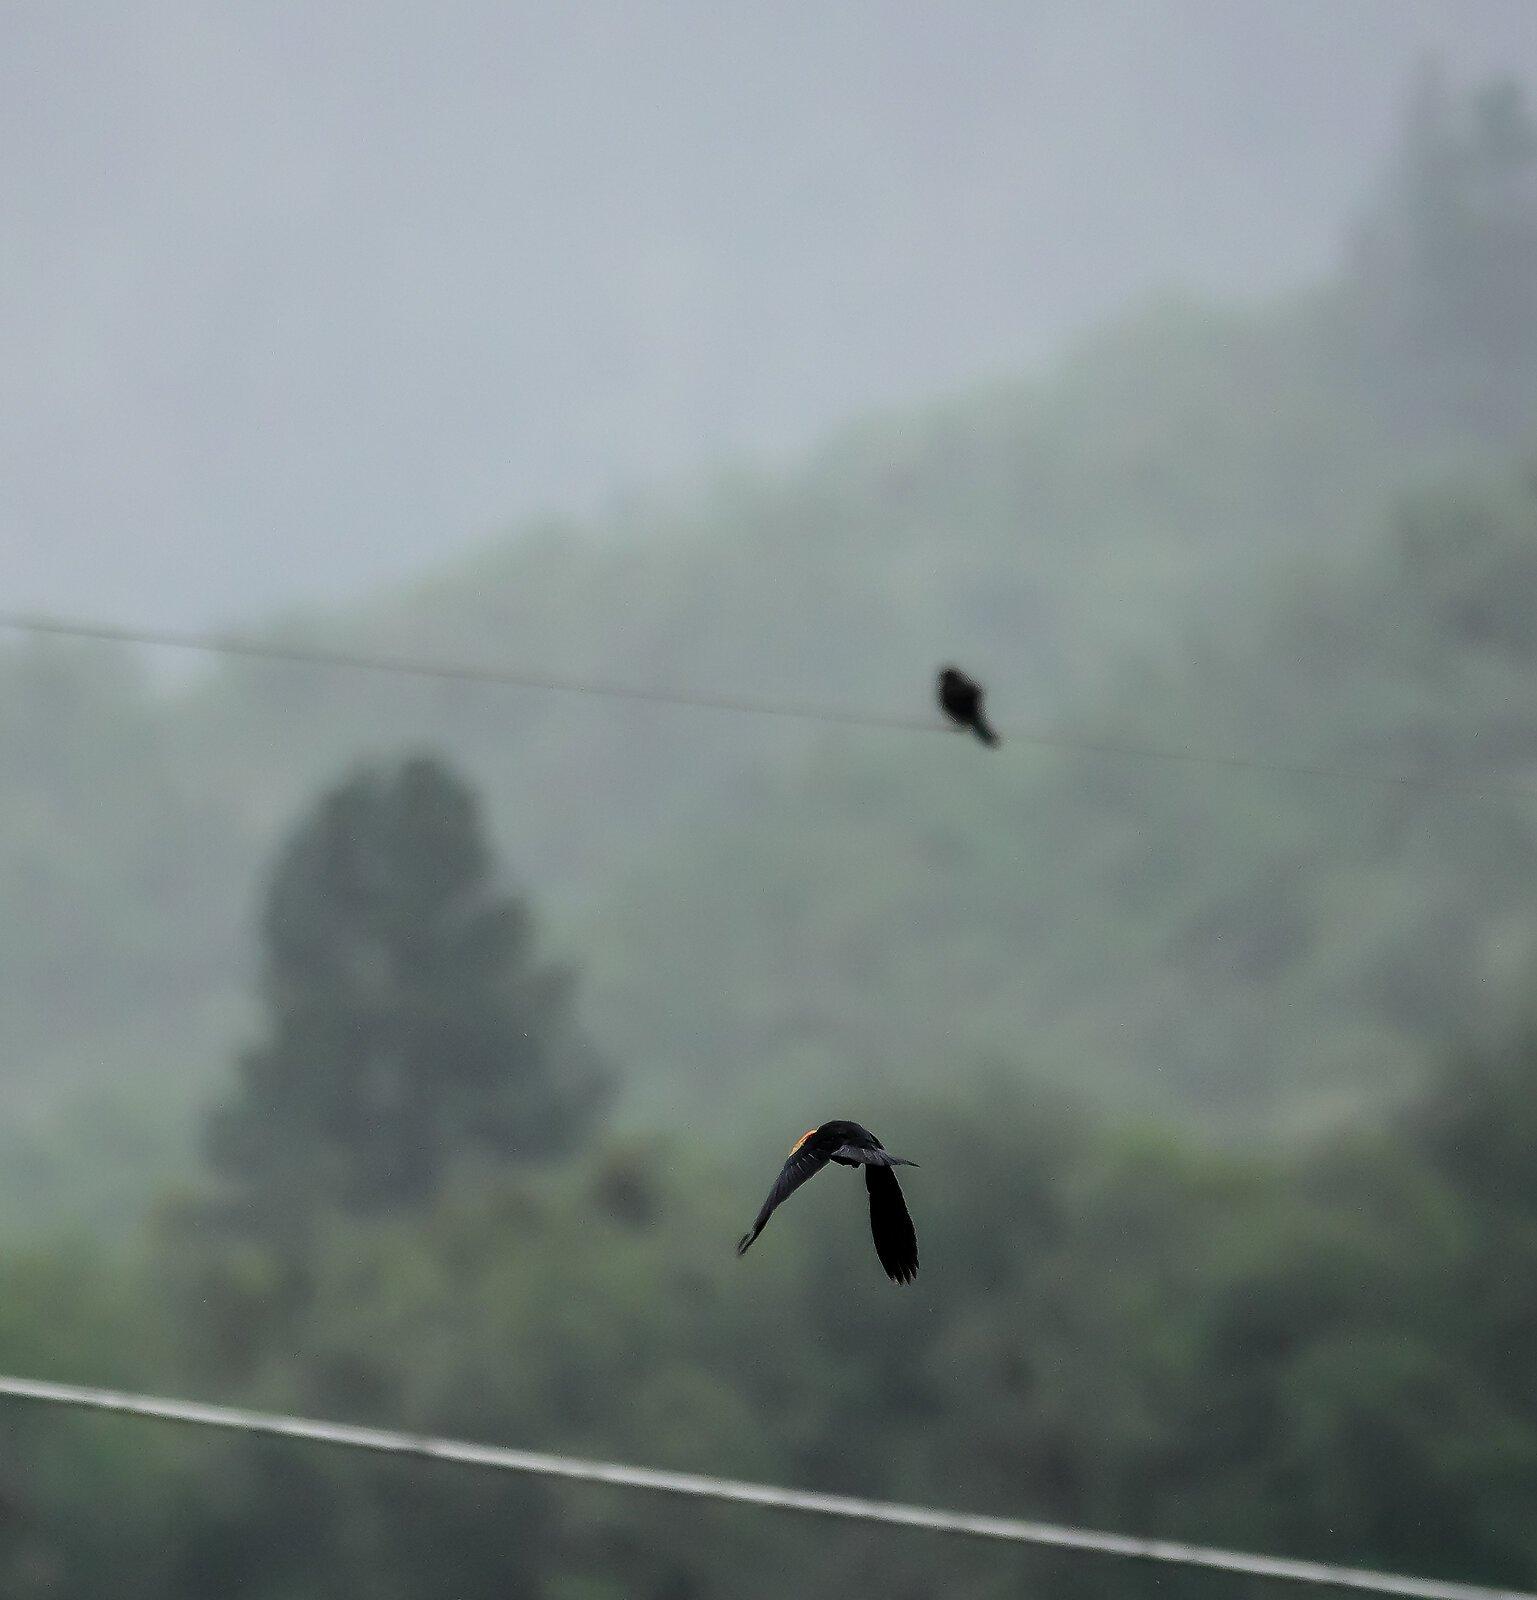 RX10_Apr24_21_blackbird_flying#7.jpg